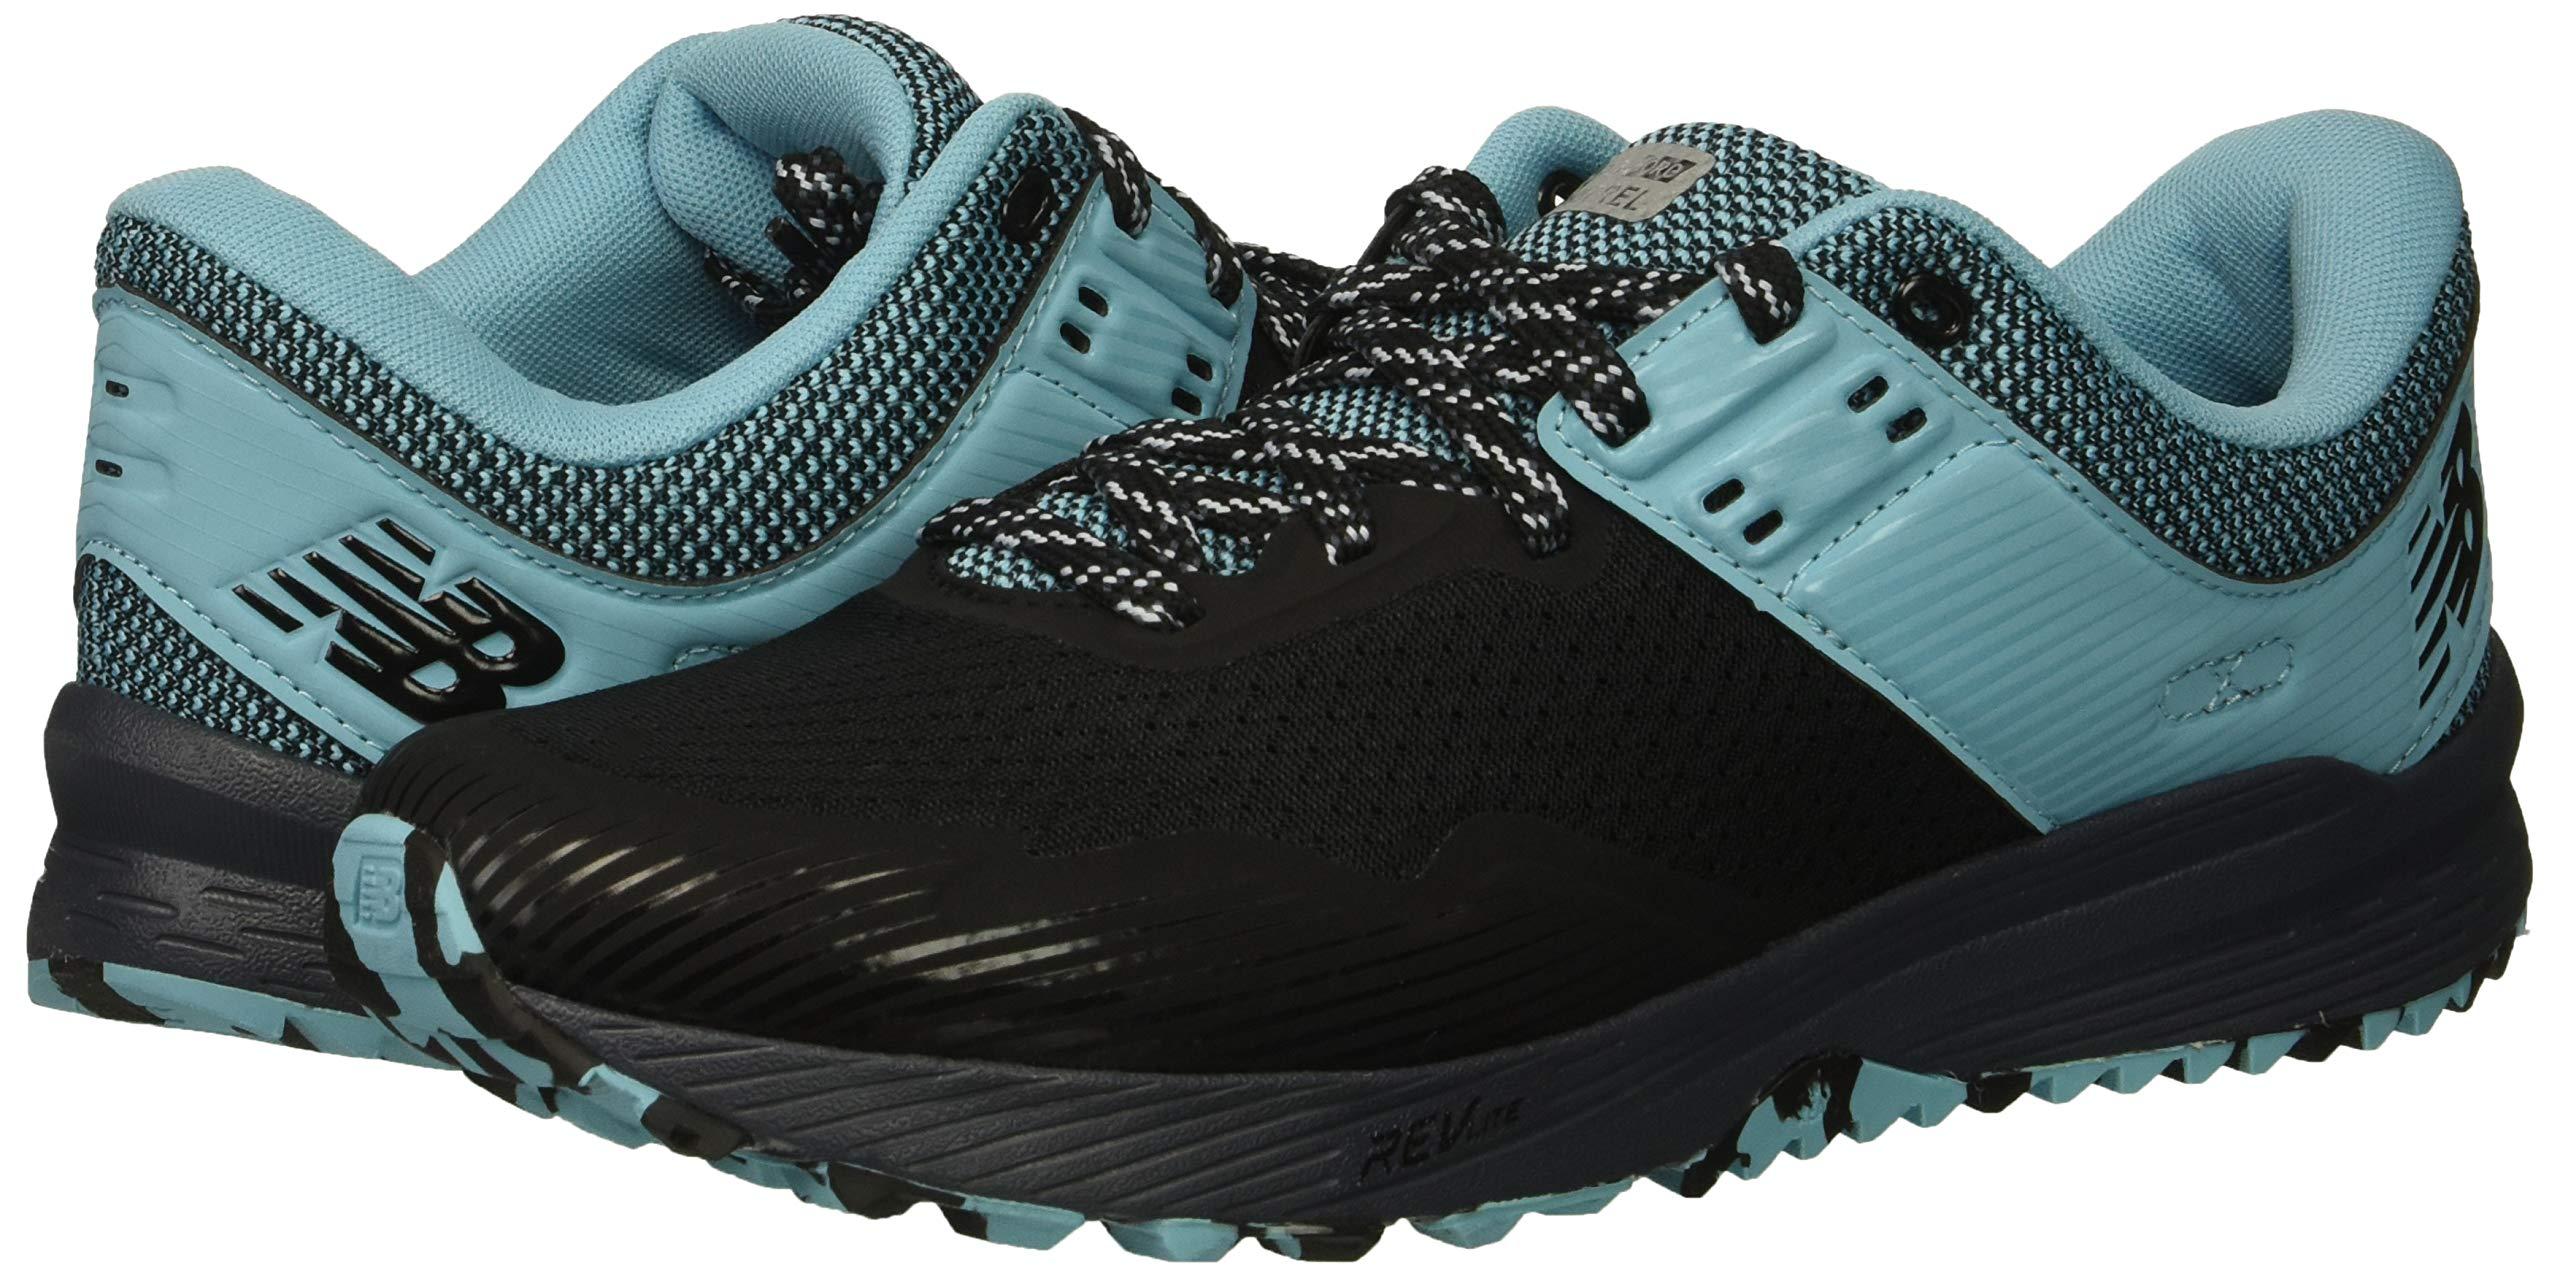 New Balance Women's Nitrel V2 FuelCore Trail Running Shoe, Black/Thunder/Enamel Blue, 6 B US by New Balance (Image #6)